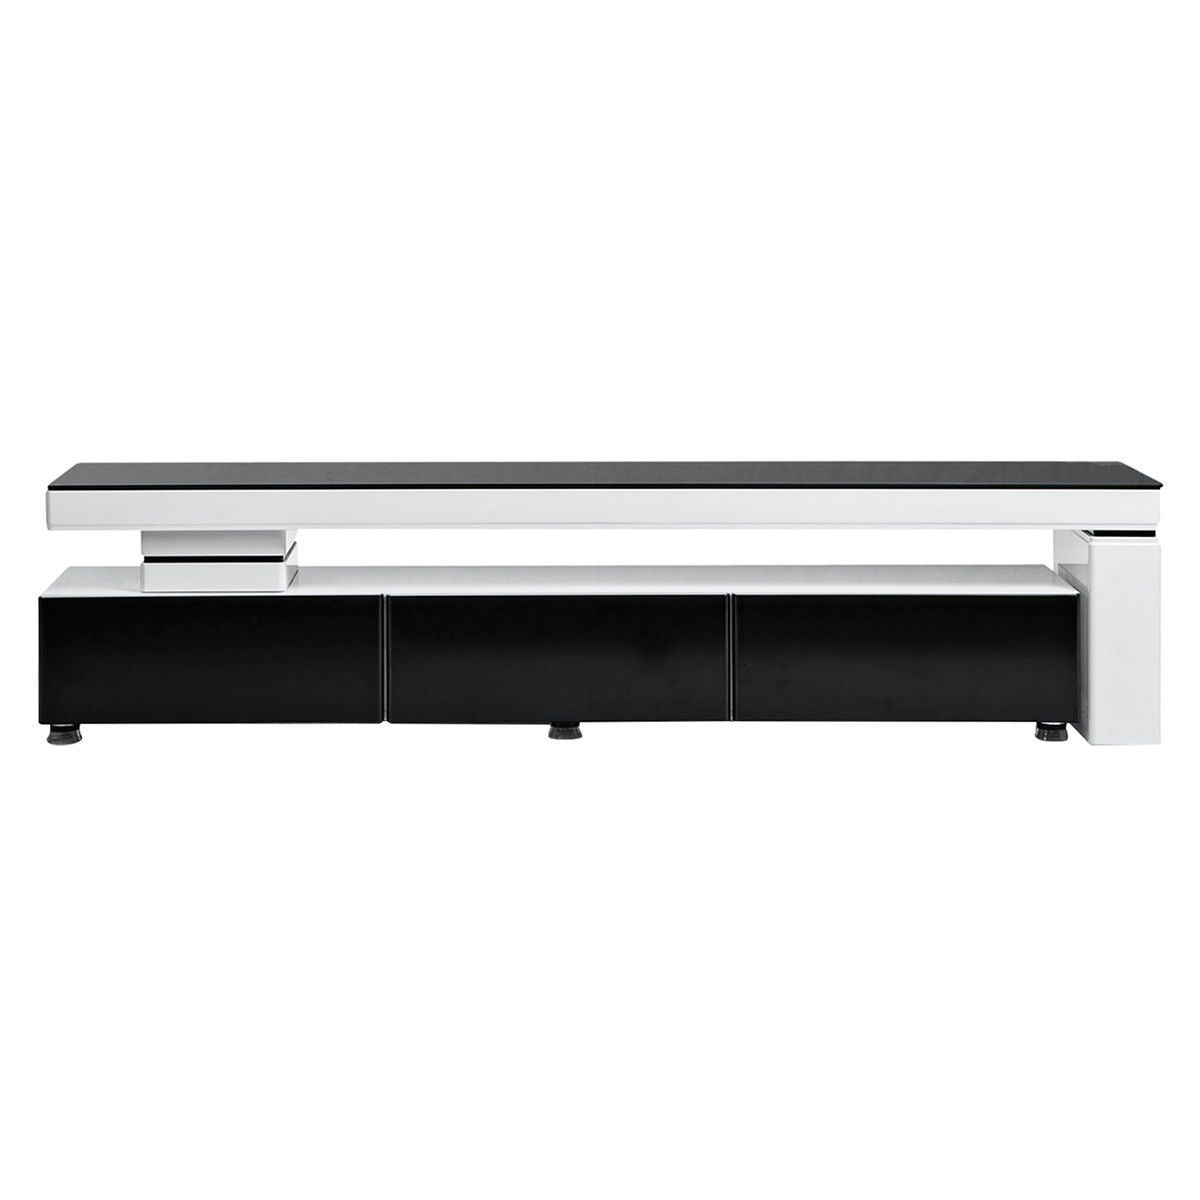 T1900 Modern 3 Drawer Extendable Lowline TV Unit - High Gloss White / Matte Black Finish